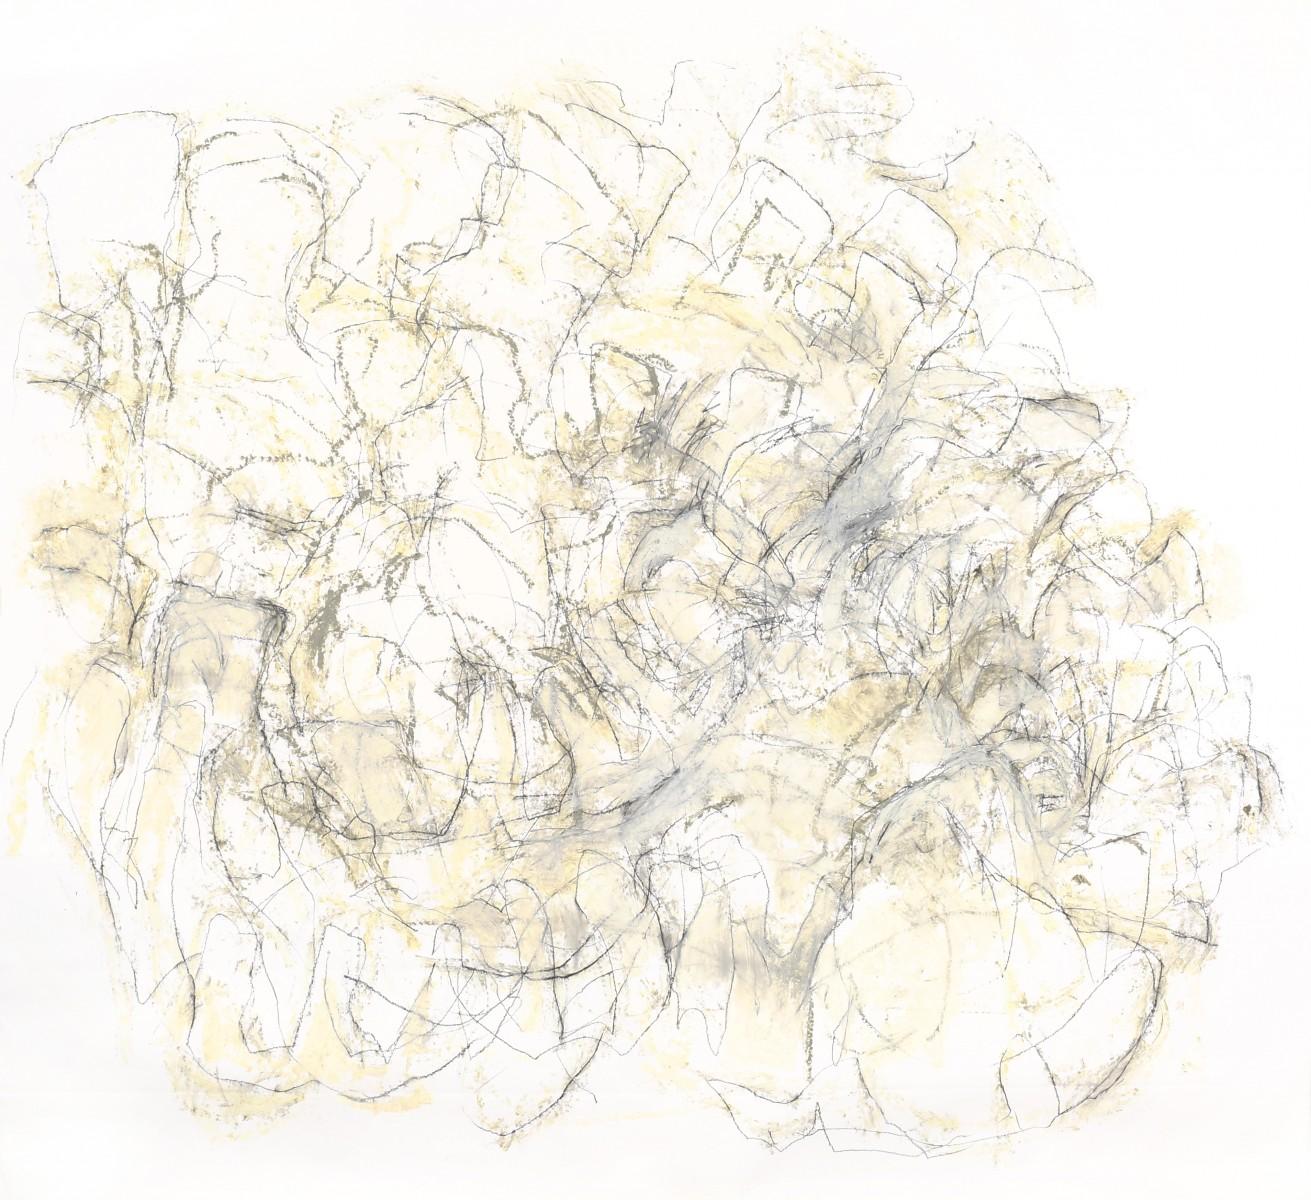 Liz Crossley, <i>Folding in</i>, 2014-2016. Charcoal, 150 x 220 cm